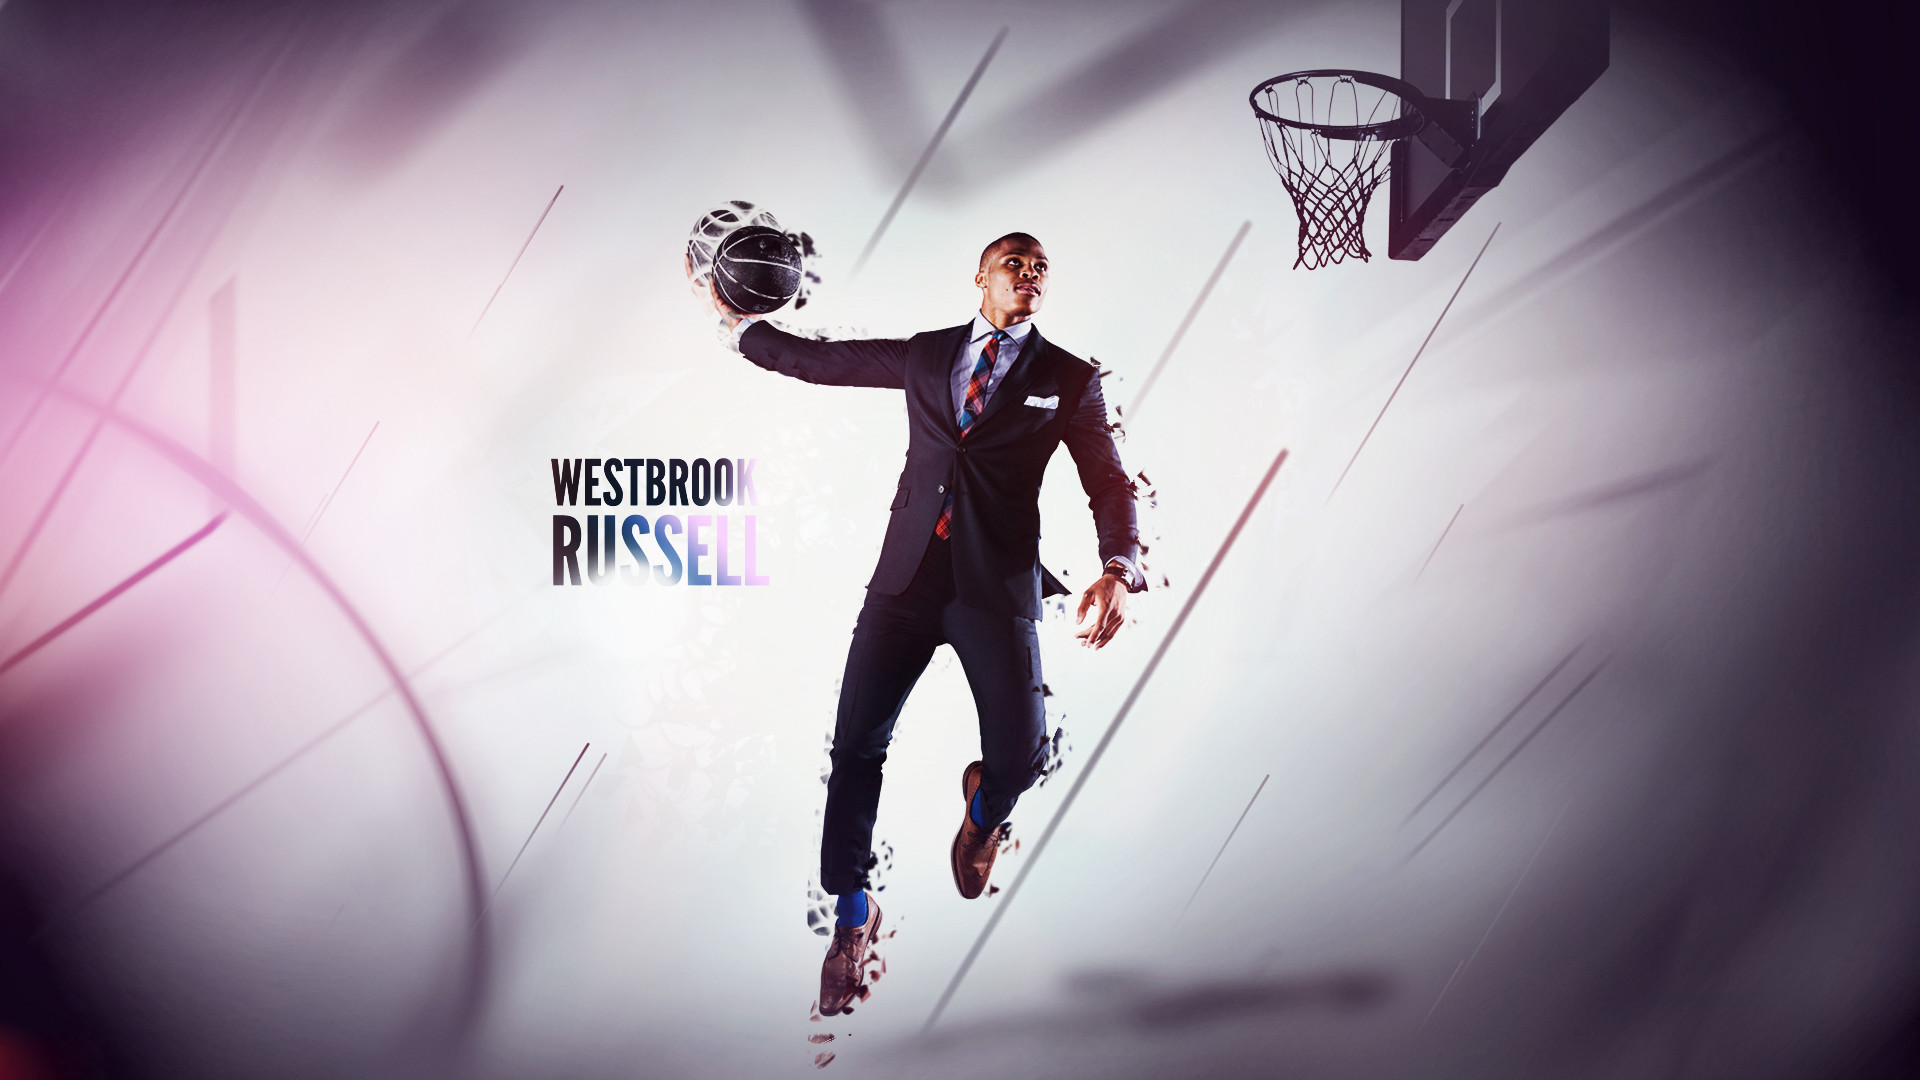 Best Russell Westbrook Wallpaper HD.